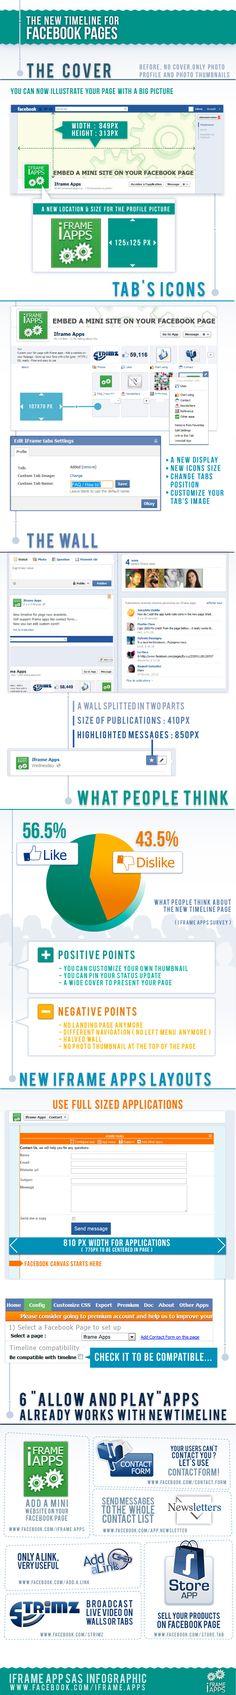 #Timeline #Facebook #Infographic